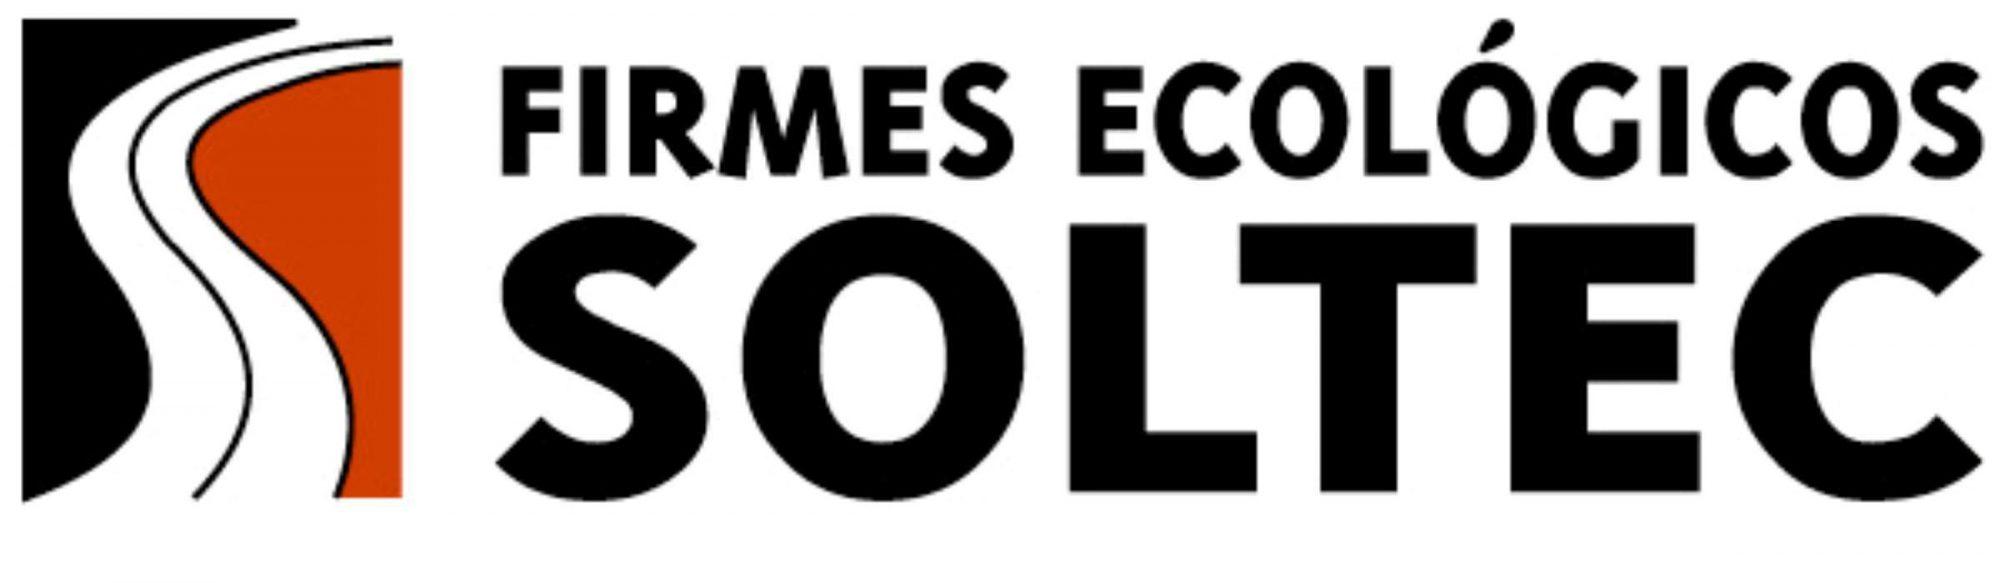 Firmes Ecológicos Soltec